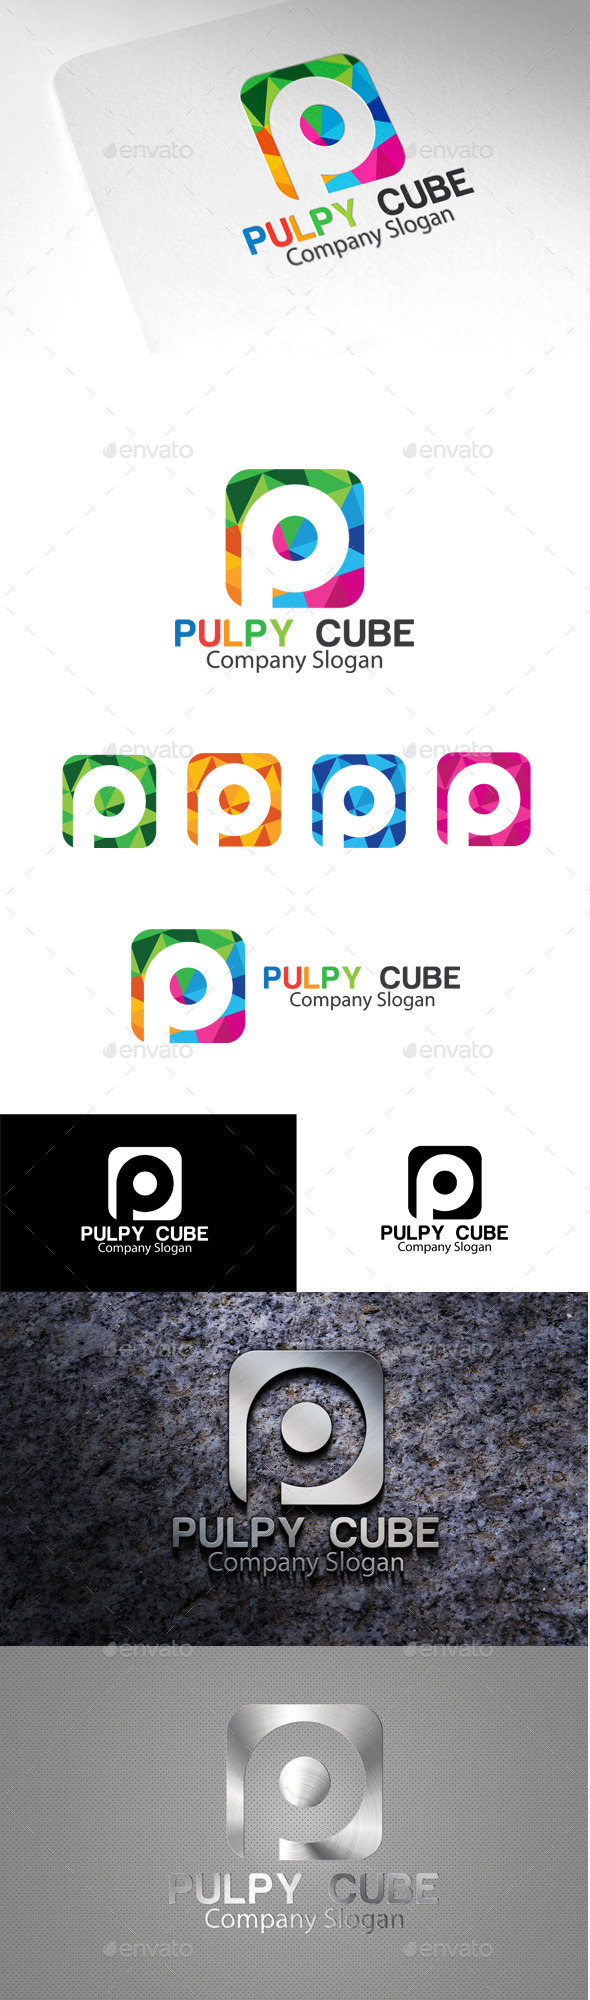 GraphicRiver Pulpy Cube P Letter Logo 10510798